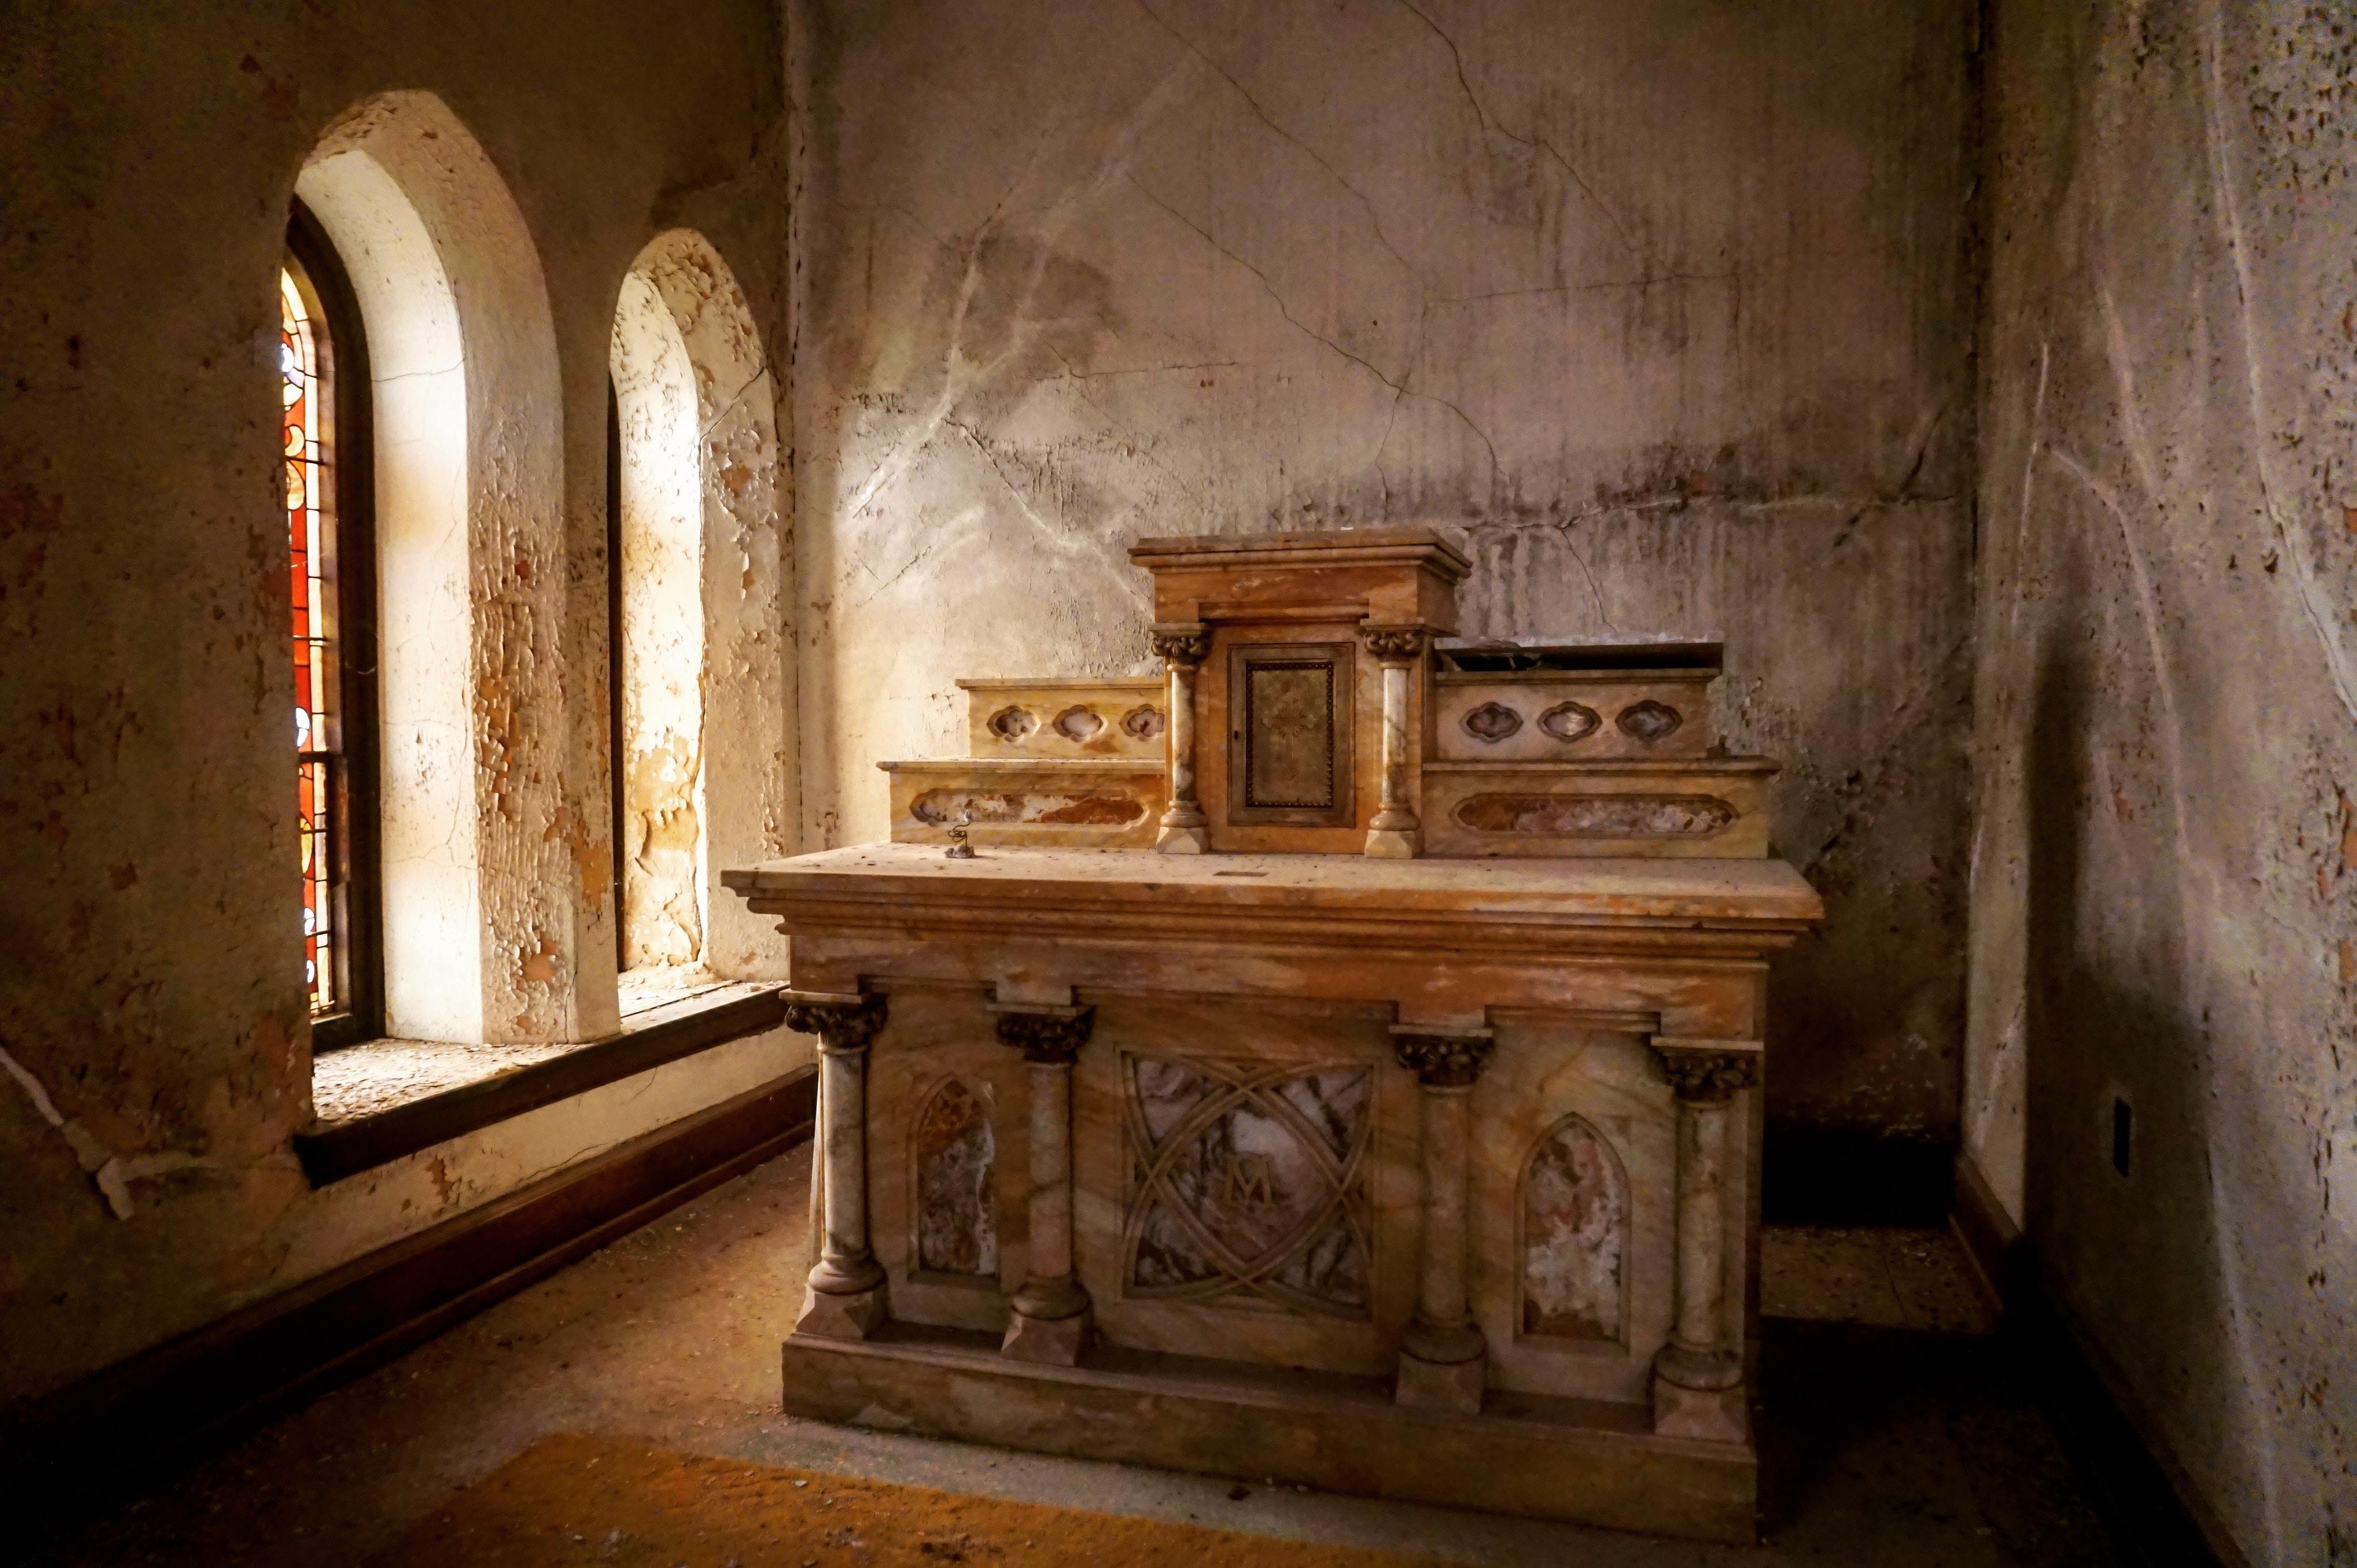 brown marble altar in room